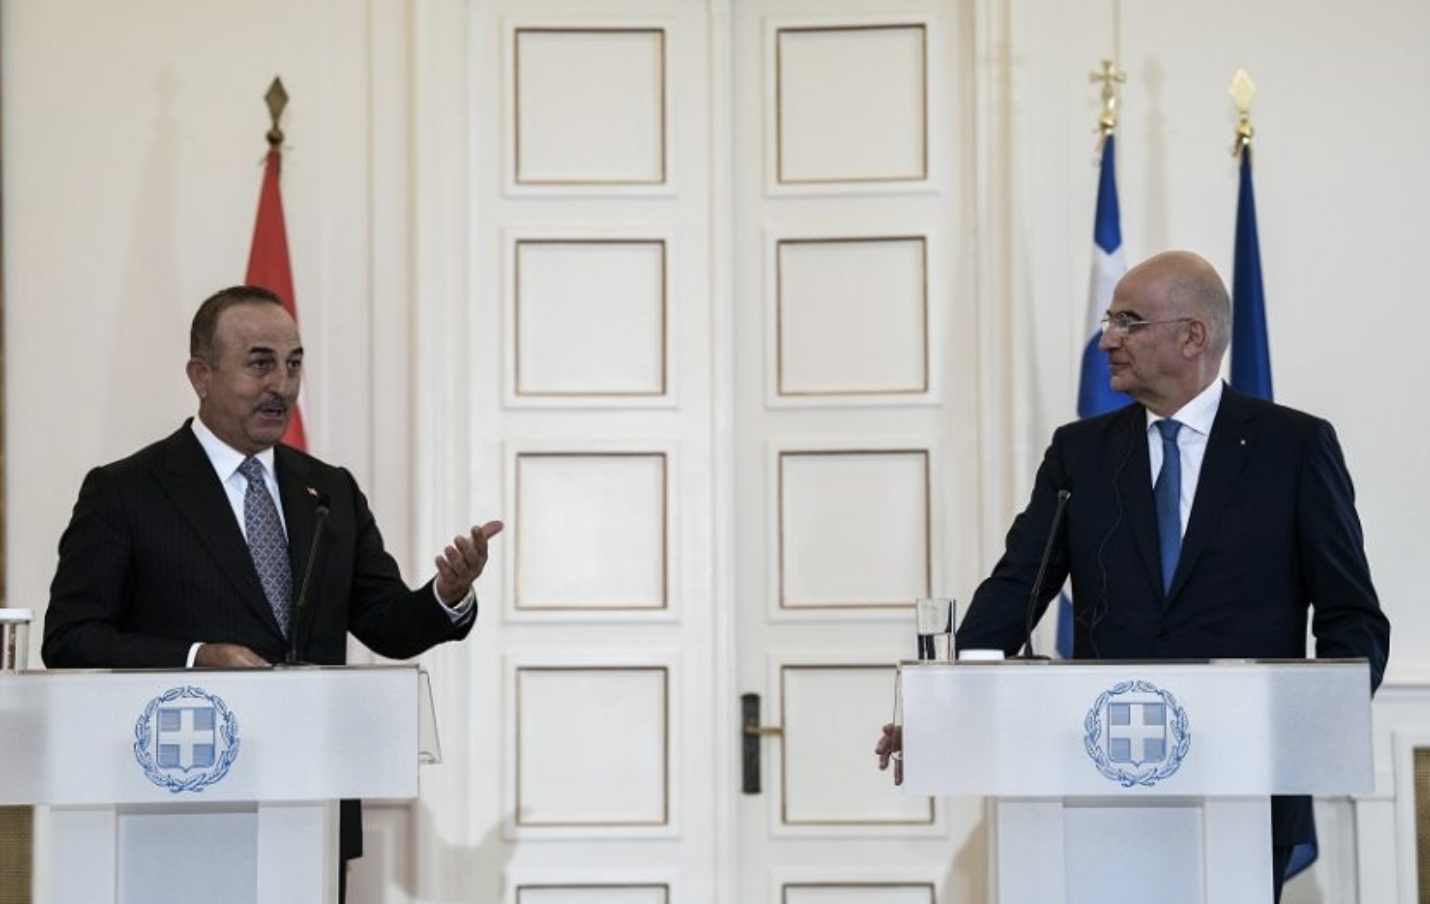 Grčka: Ekonomska saradnja u središtu razgovora Dendias – Čavušoglu